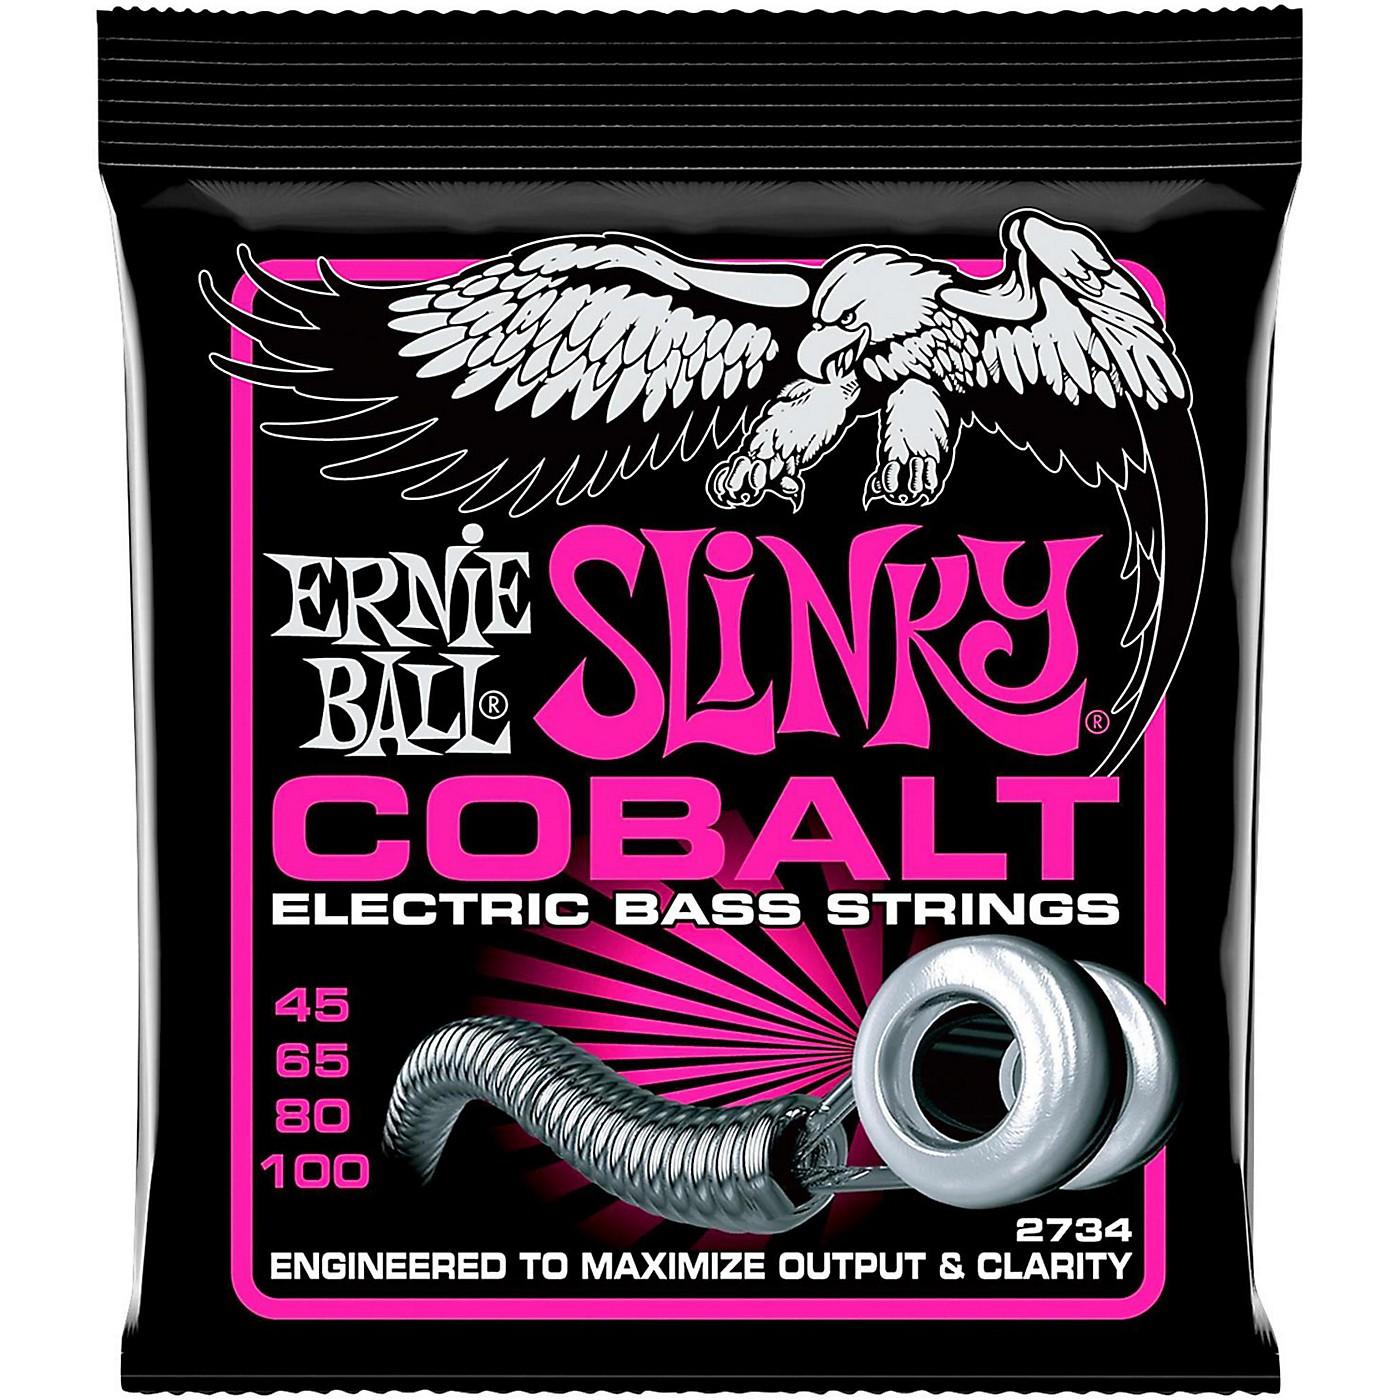 Ernie Ball 2734 Cobalt Super Slinky Electric Bass Strings thumbnail